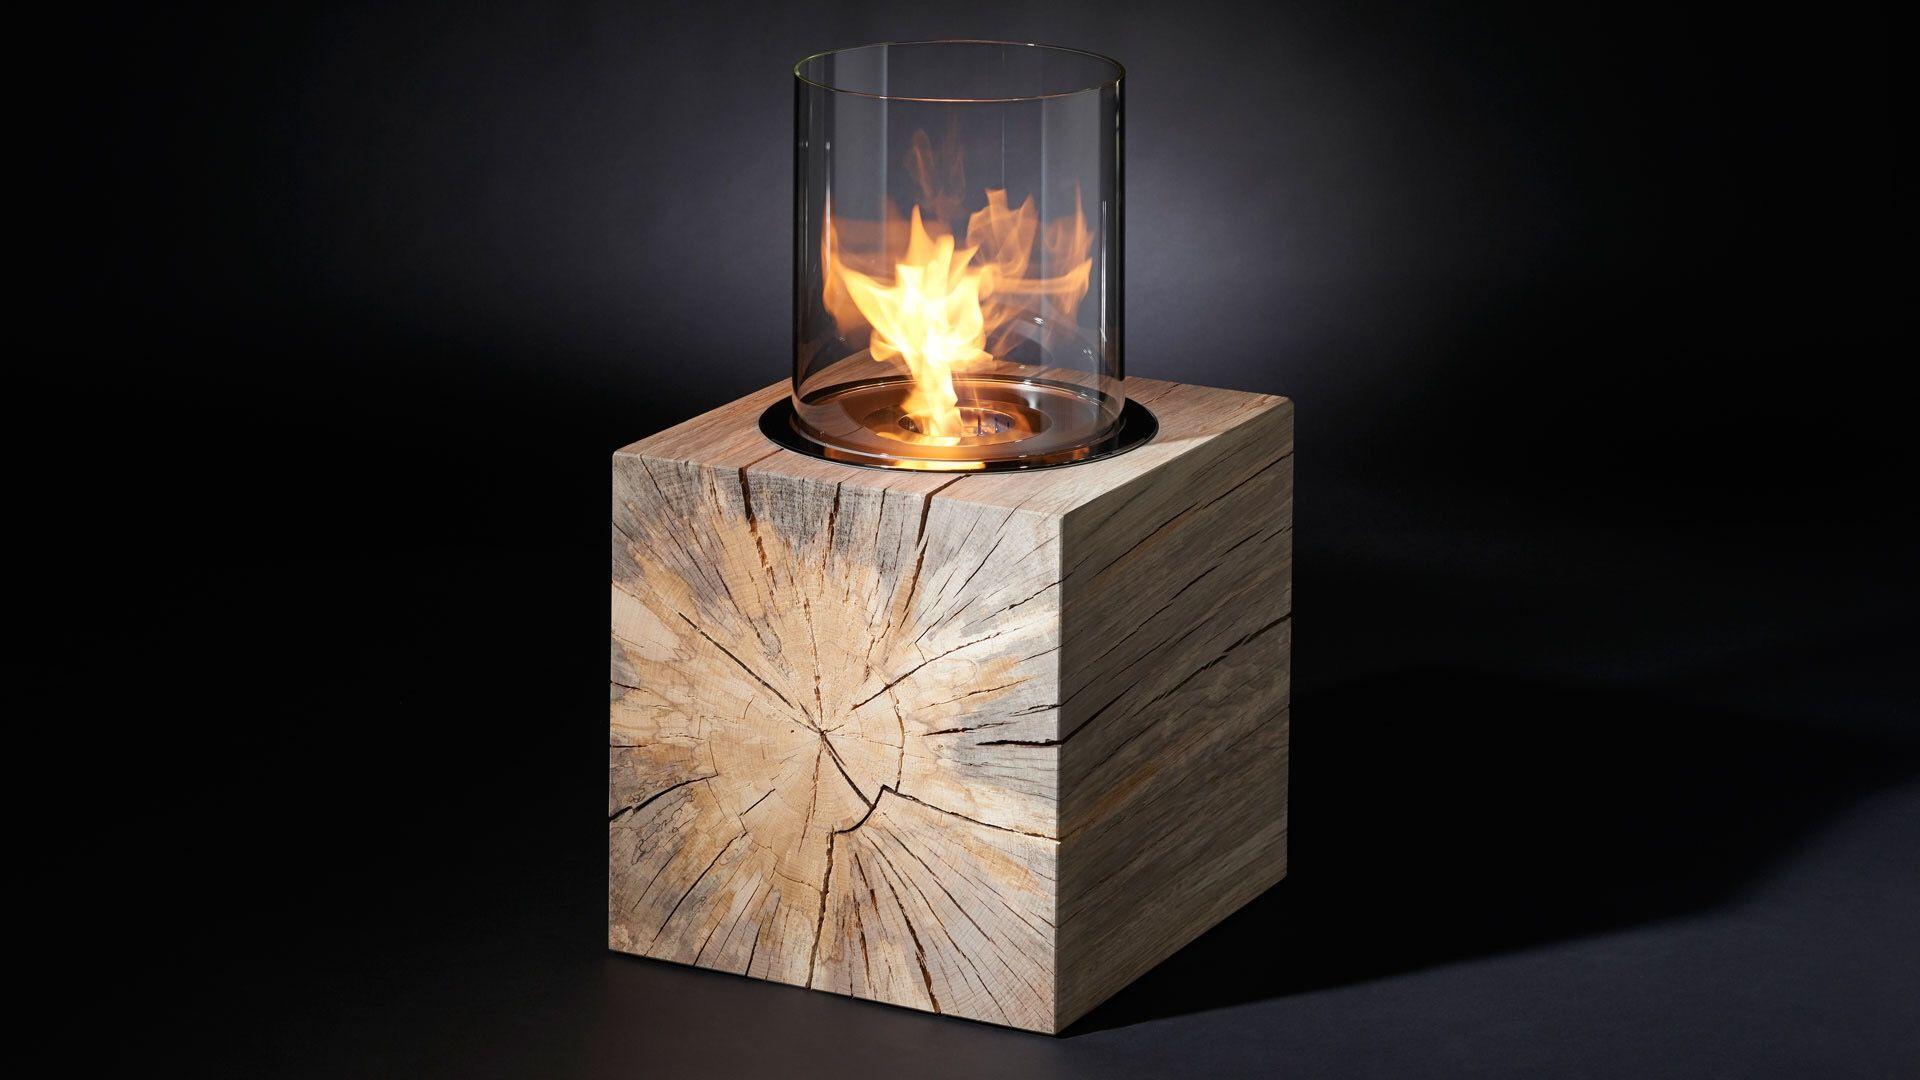 Design Feuerstelle In Kubus Aus Wunderschoner Stockbuche Feuerstelle Kaminfeuer Design